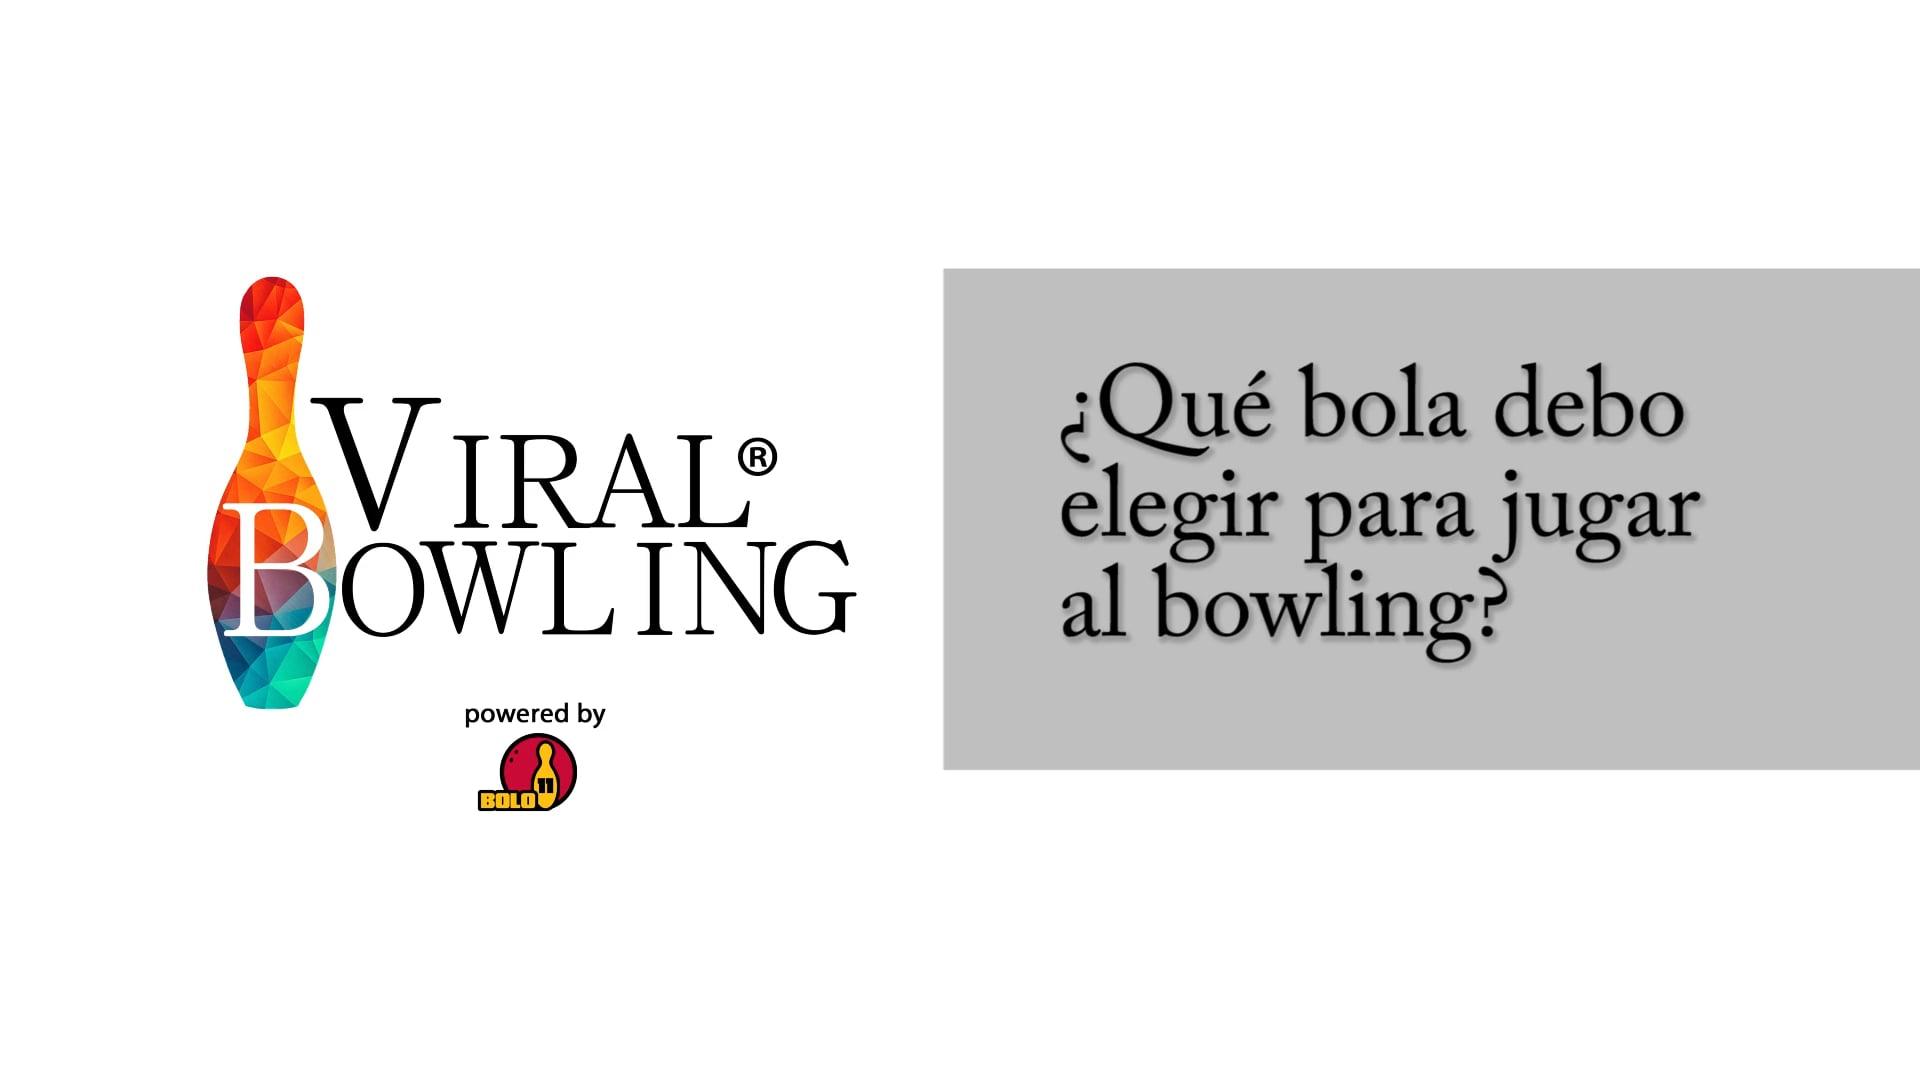 #ViralBowling: Cuál es la bola apropiada para jugar al bowling